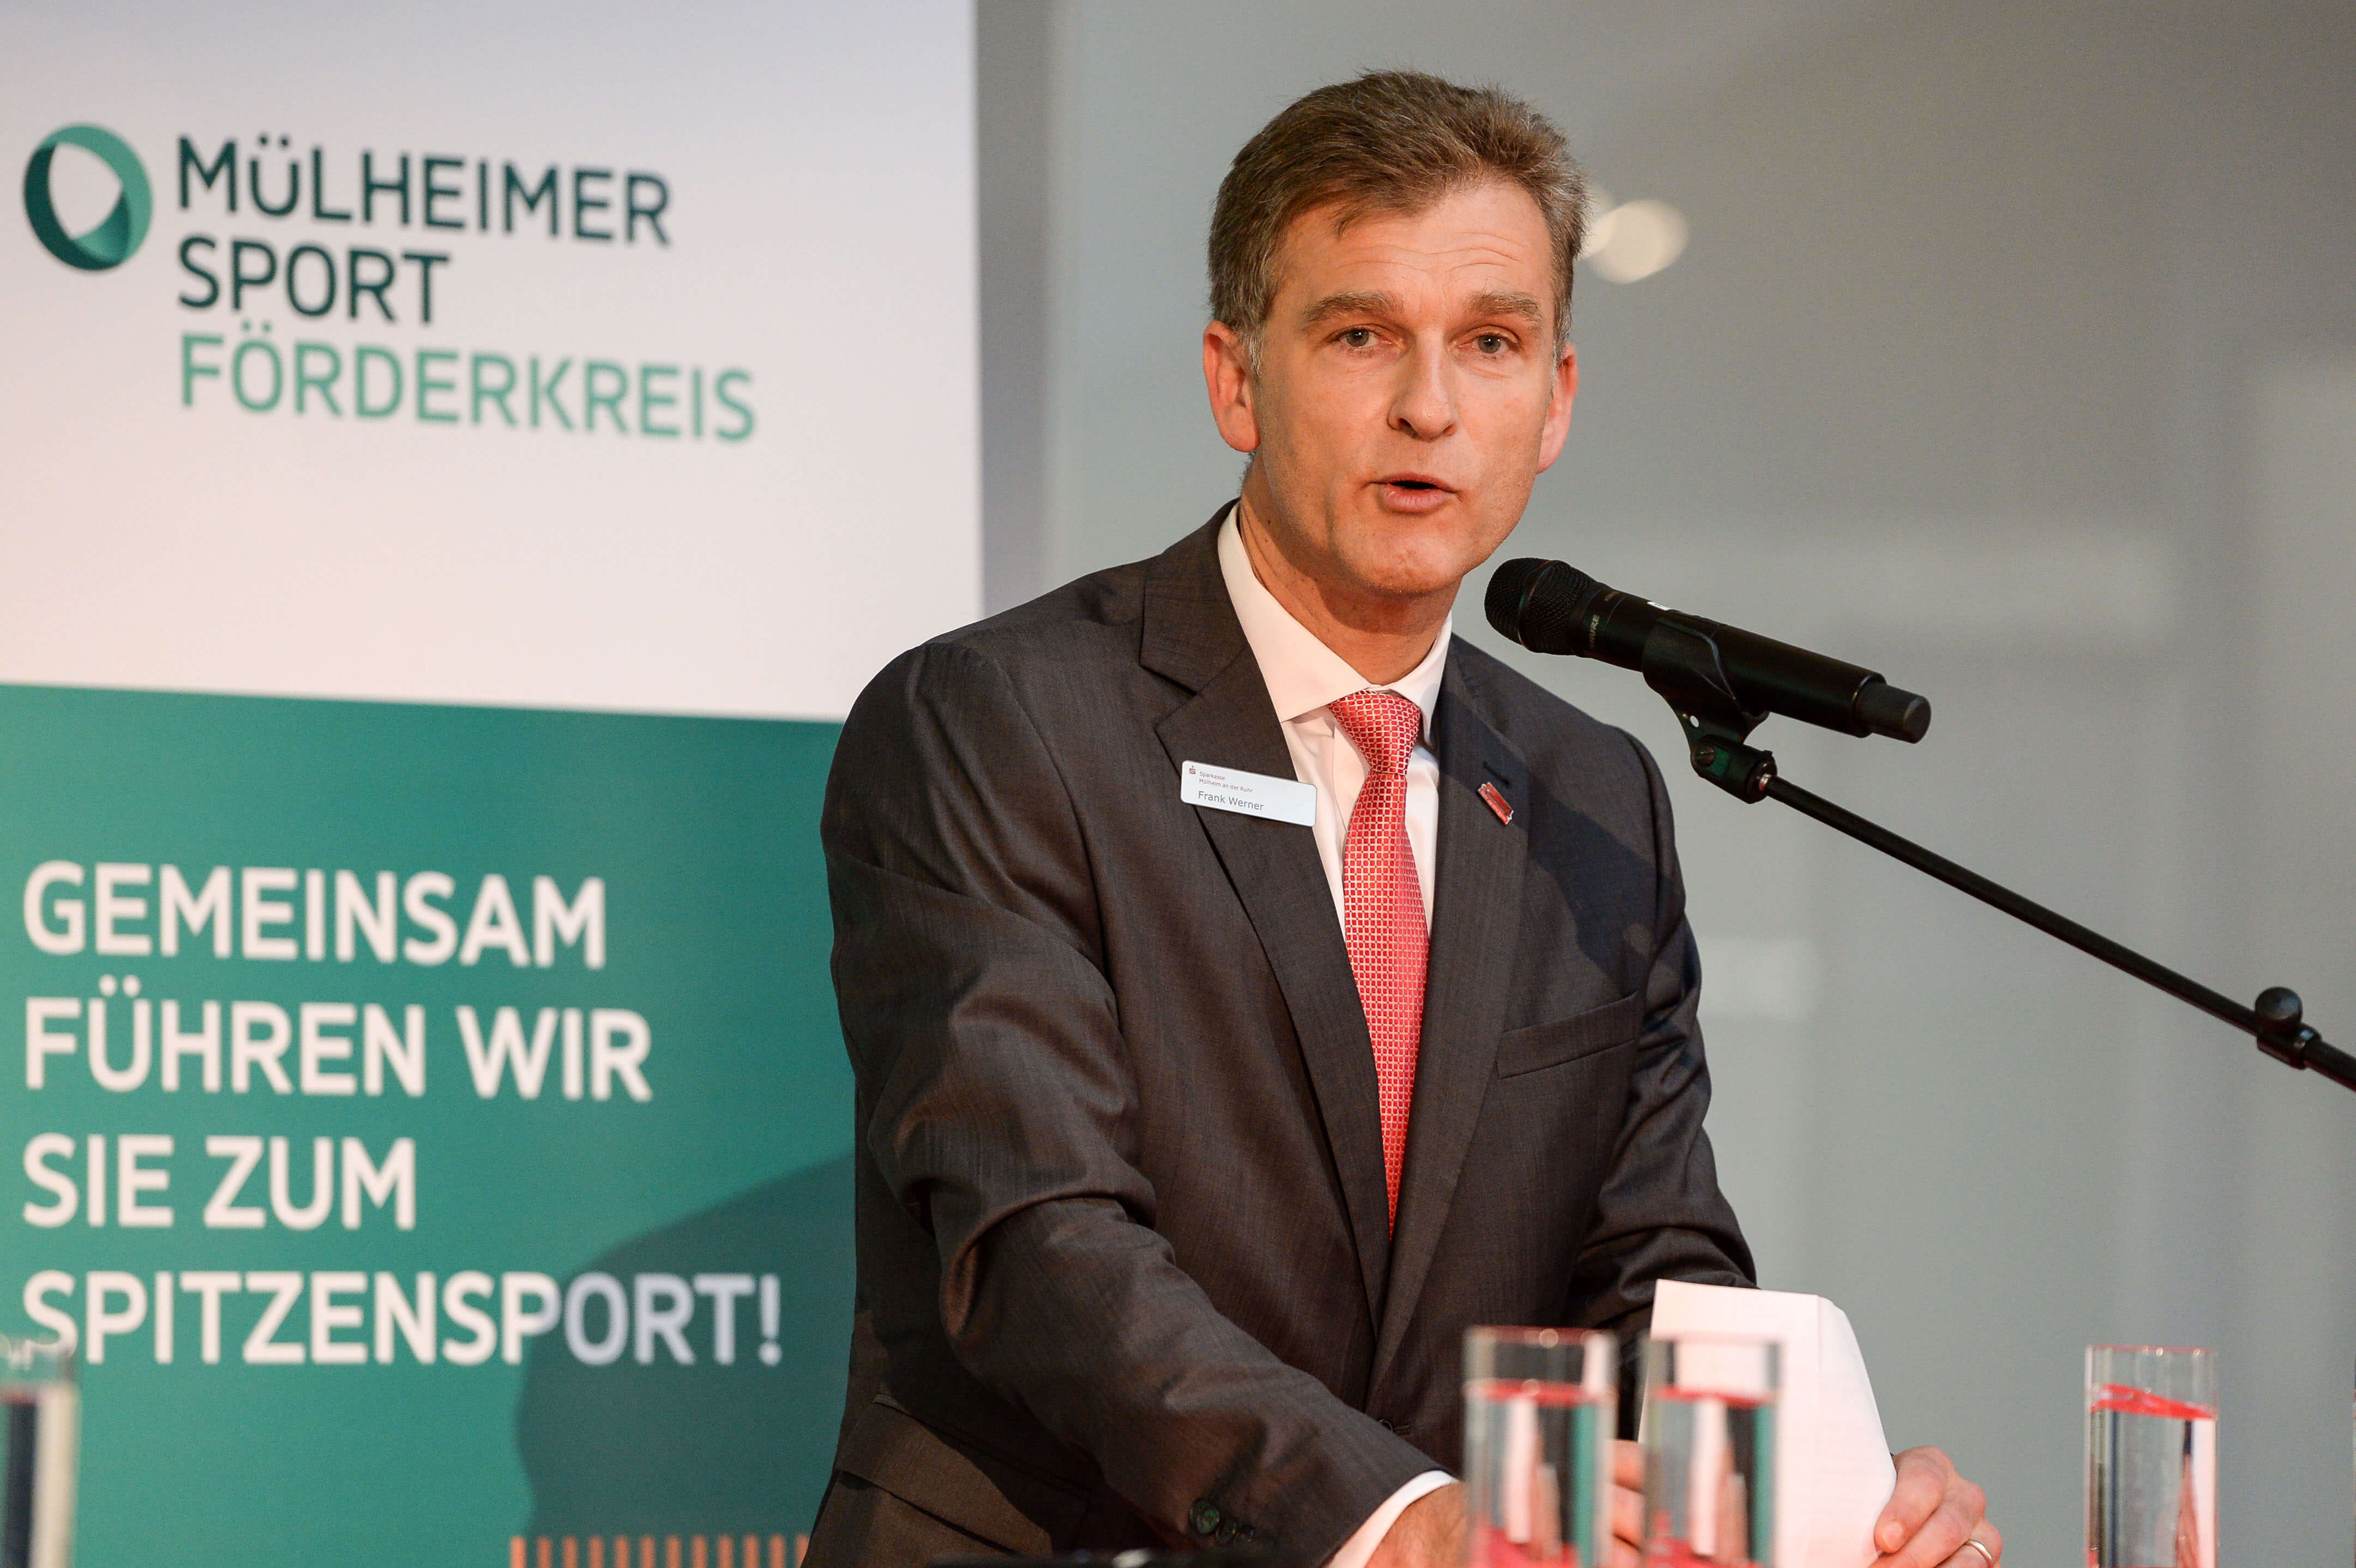 Vorsitzender Frank Werner